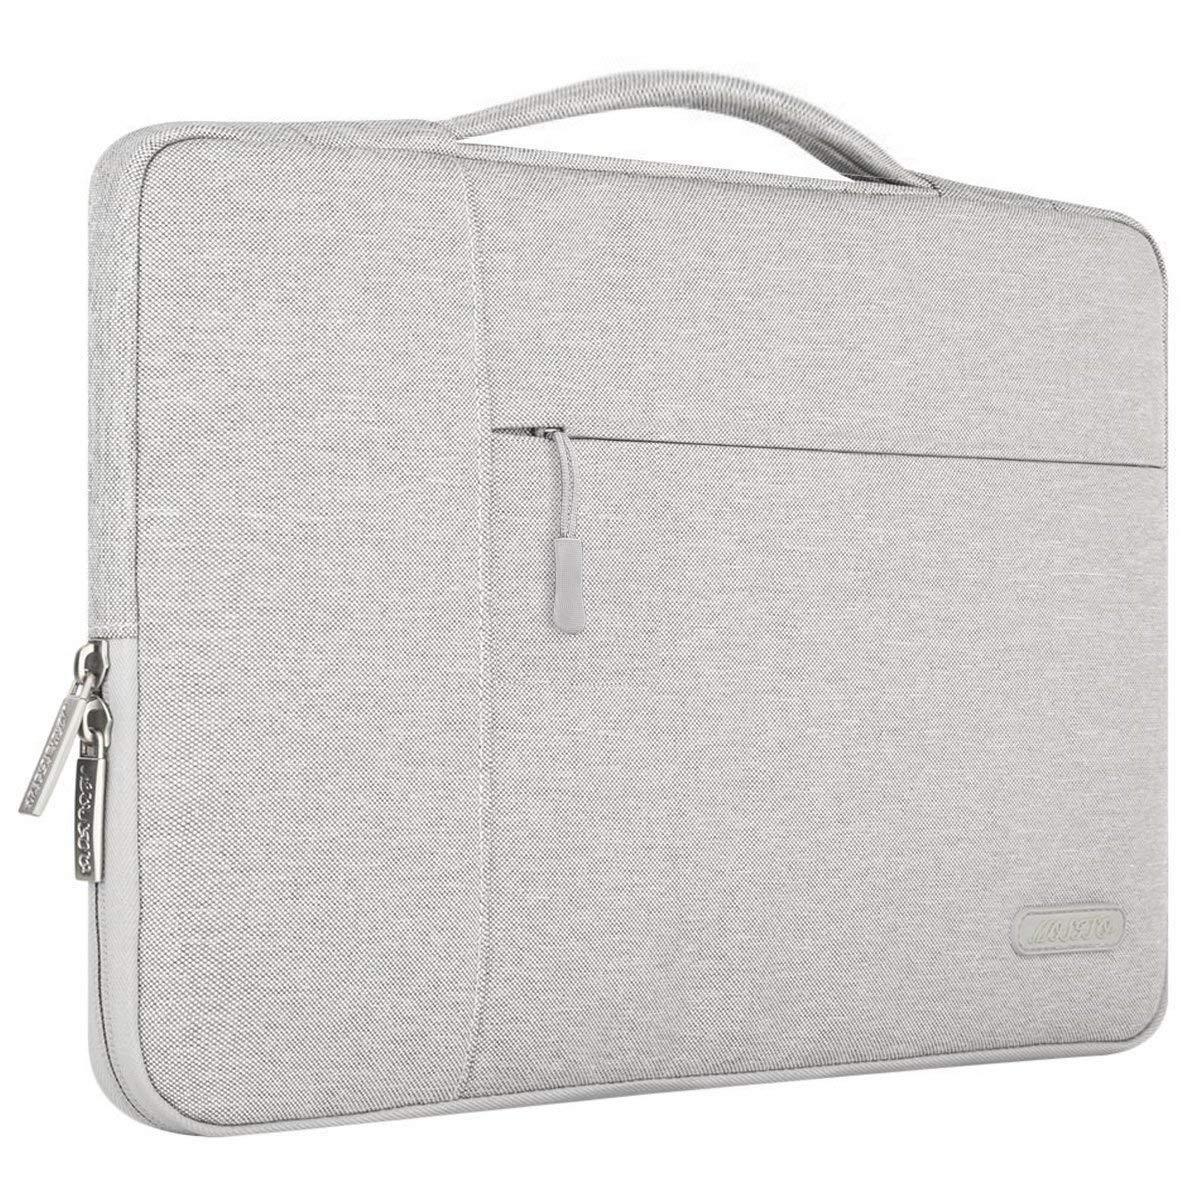 Funda Para Laptop de 13 Inch - gris - Mosiso